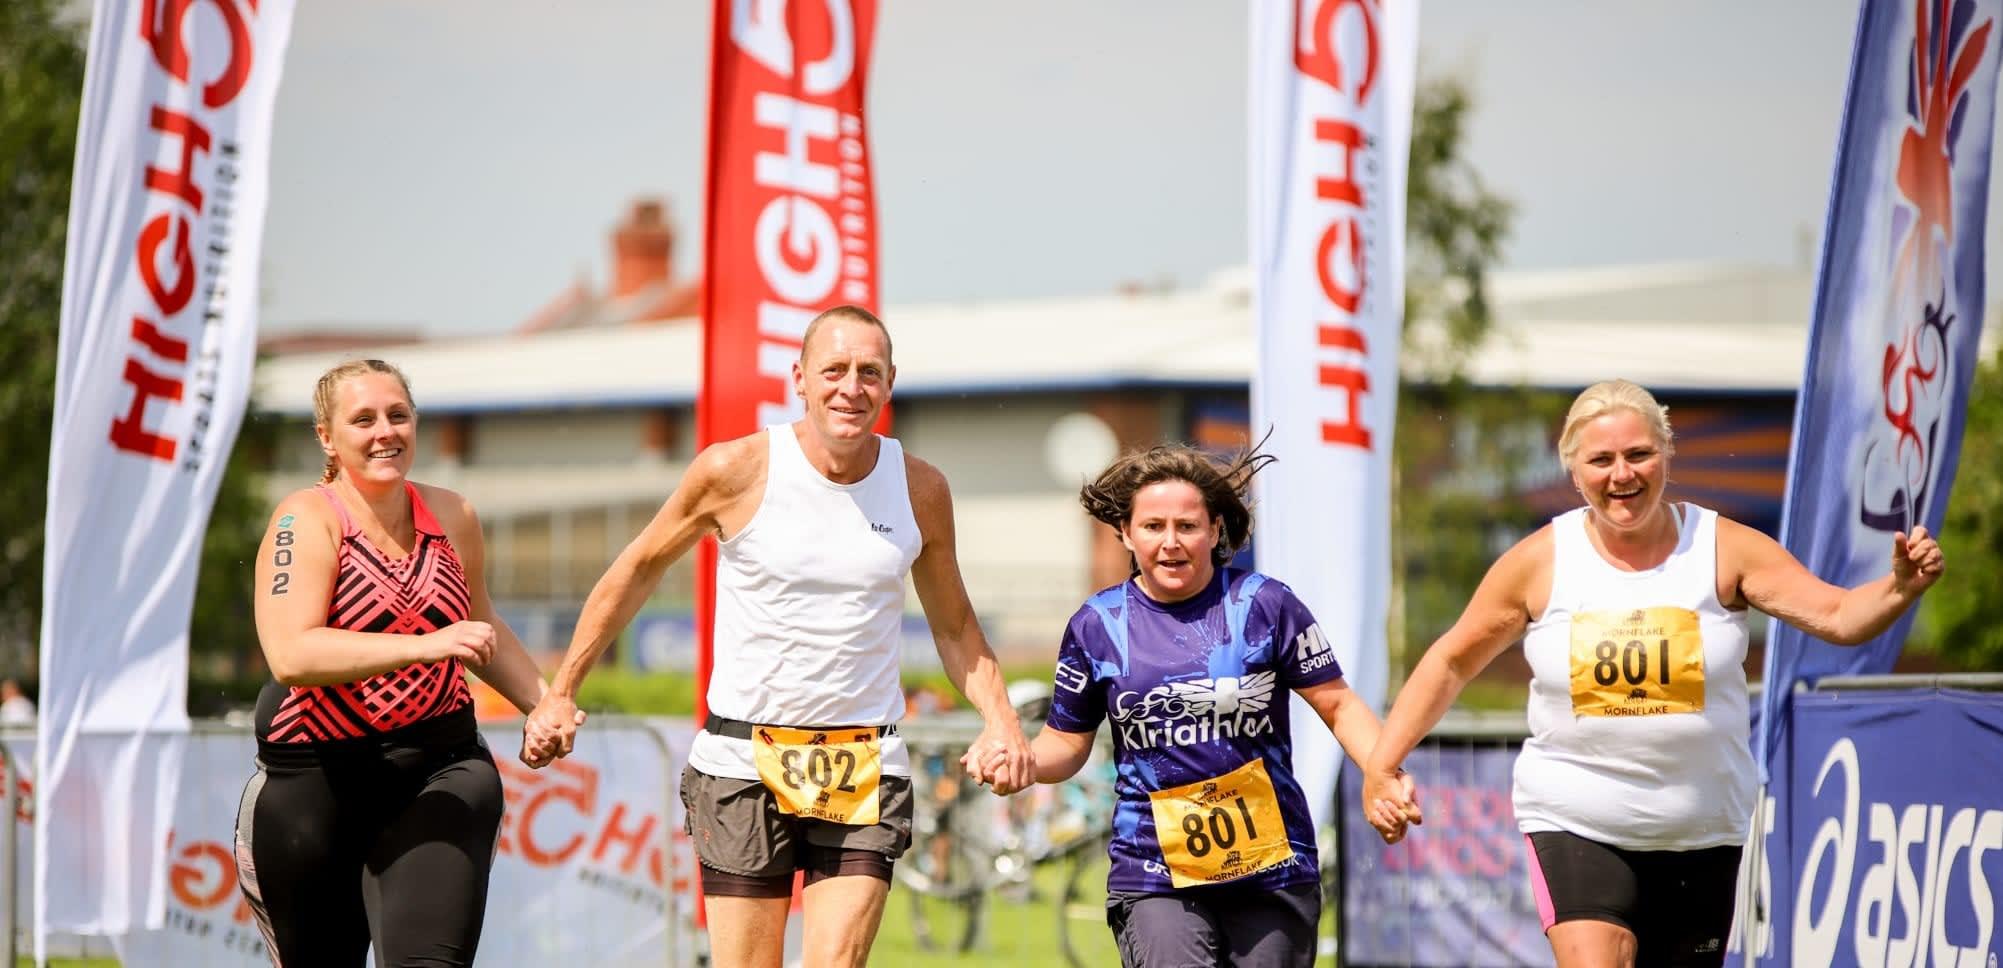 Cheshire Triathlon